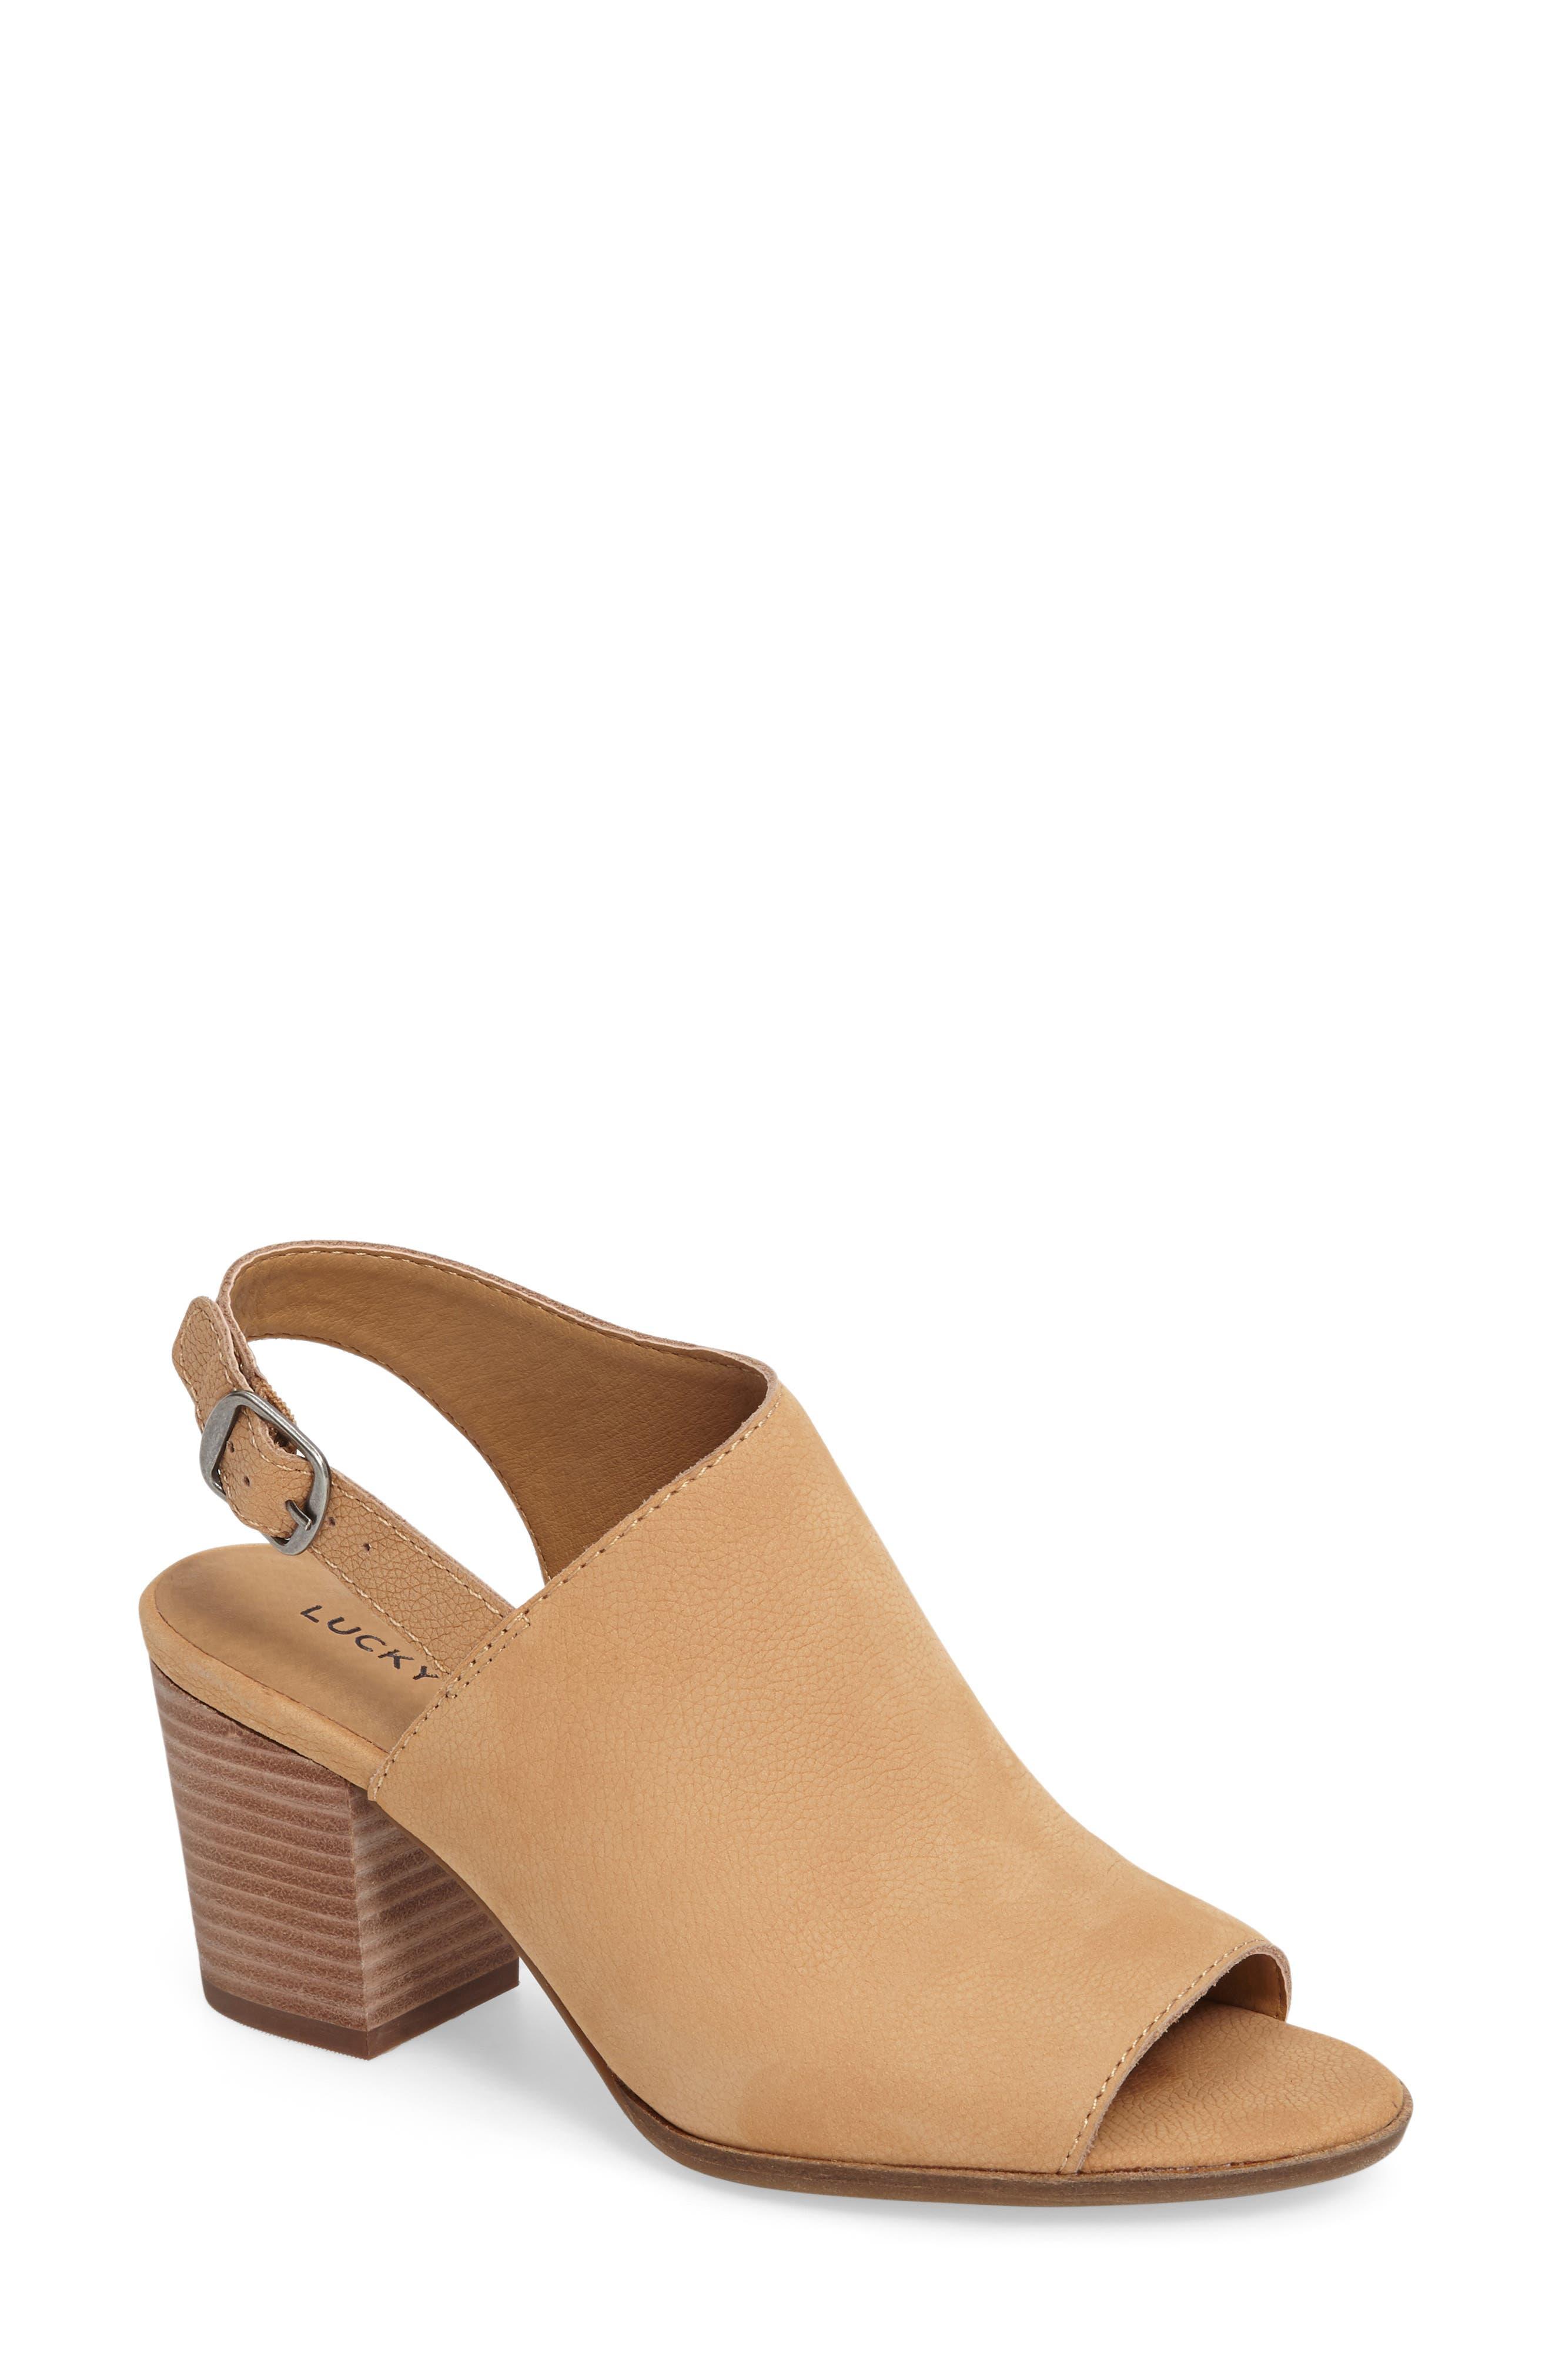 Alternate Image 1 Selected - Lucky Brand Obelia Block Heel Sandal (Women)